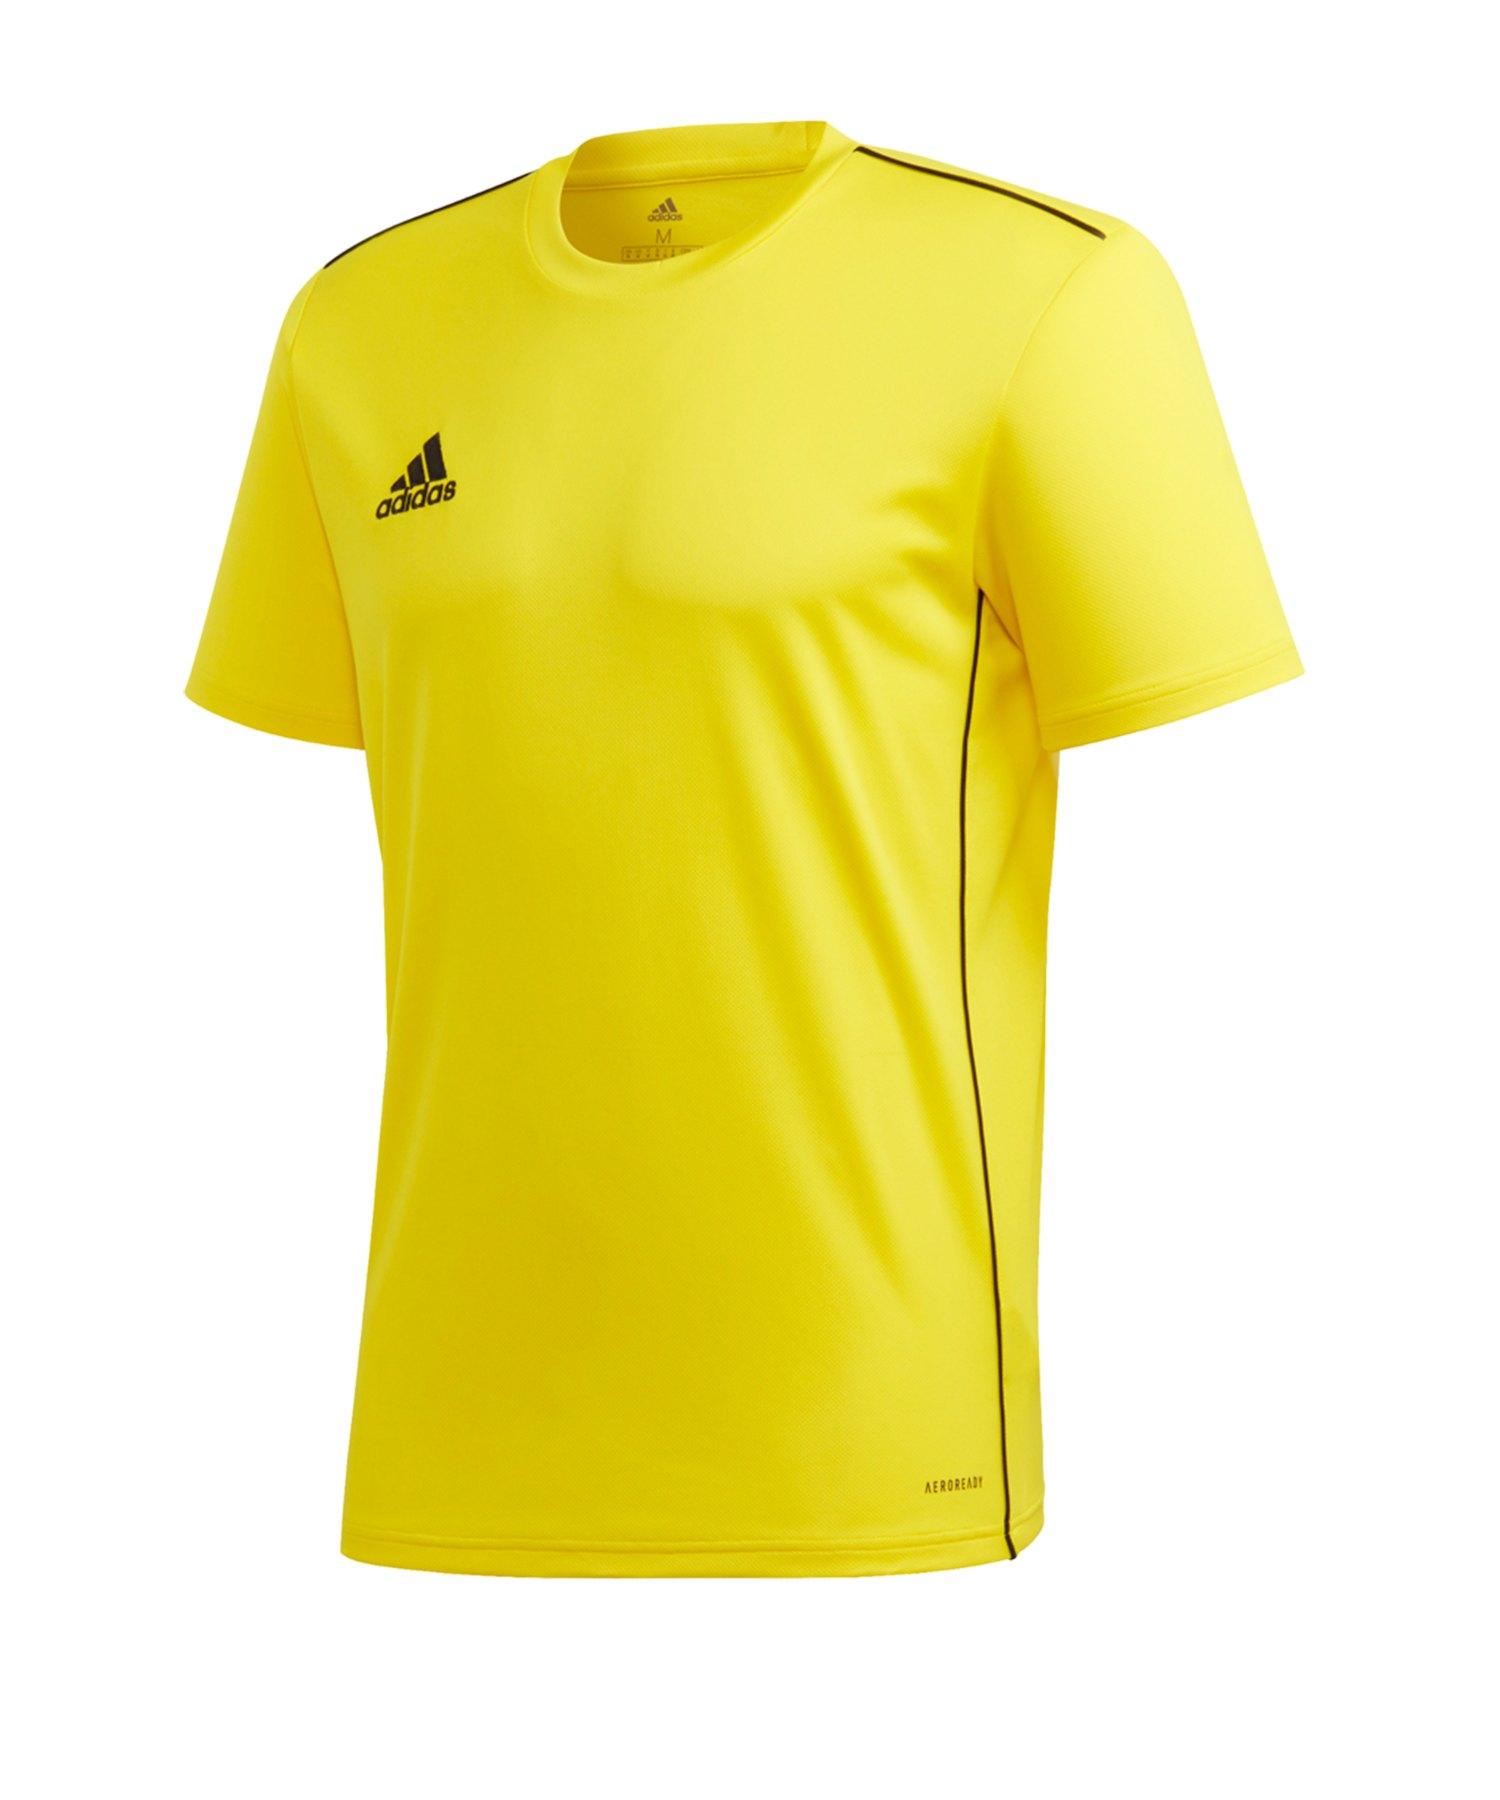 adidas Core 18 Training Tee T-Shirt Gelb - gelb